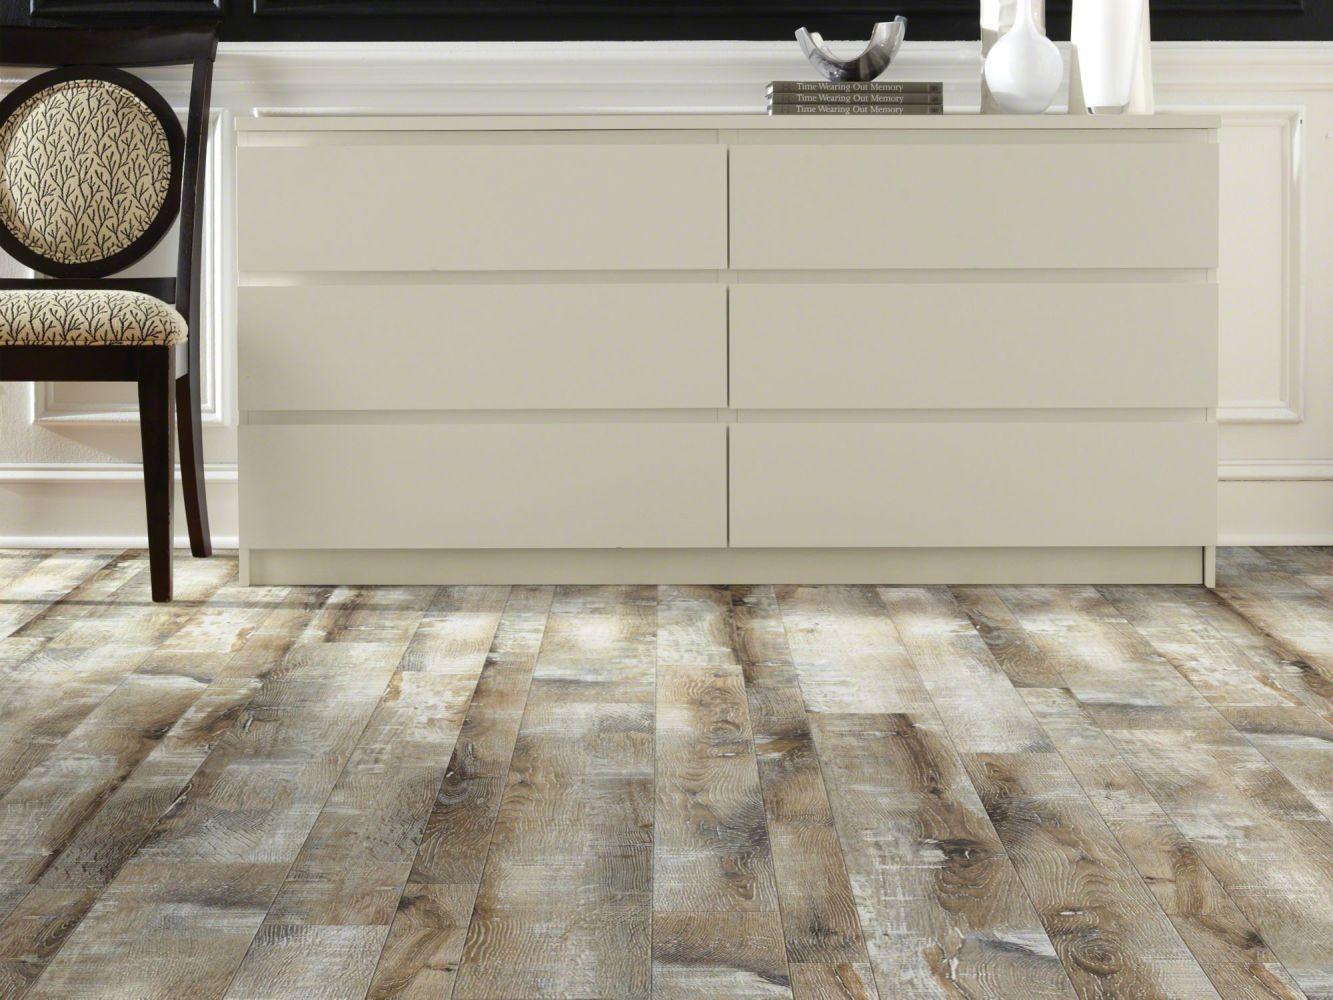 Shaw Floors Home Fn Gold Laminate Home Living Radical Rustic 05010_HL086